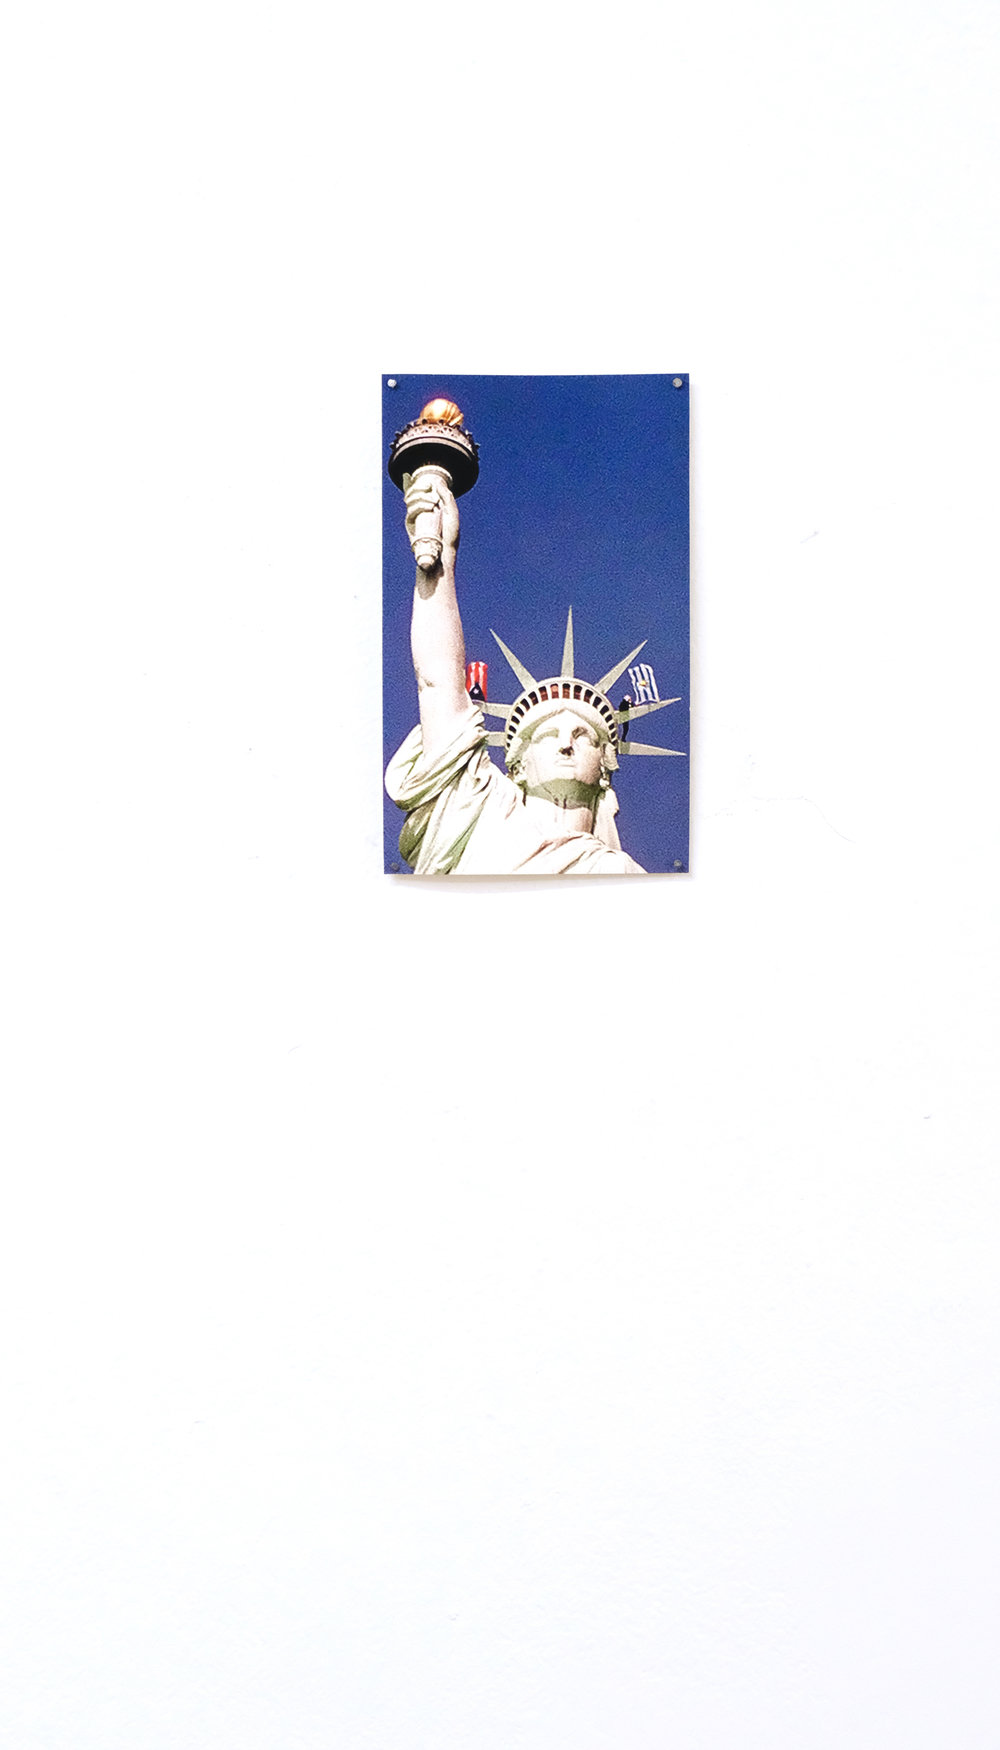 Tito Kayak / Untitled, 2001 / Impresión digital sobre papel algodón